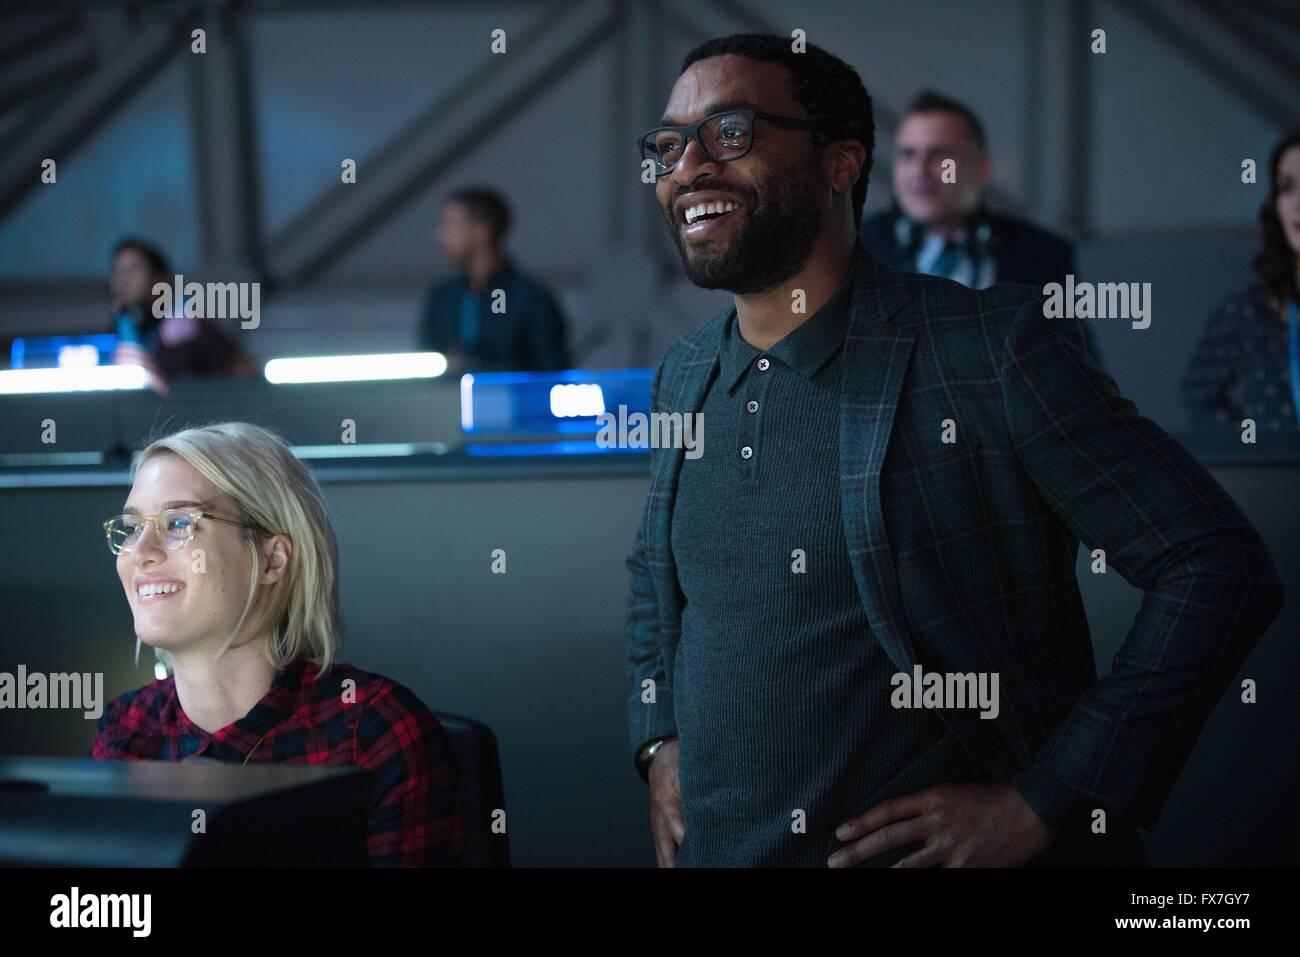 The Martian Year : 2015 USA Director : Ridley Scott Kristen Wiig, Chiwetel Ejiofor - Stock Image